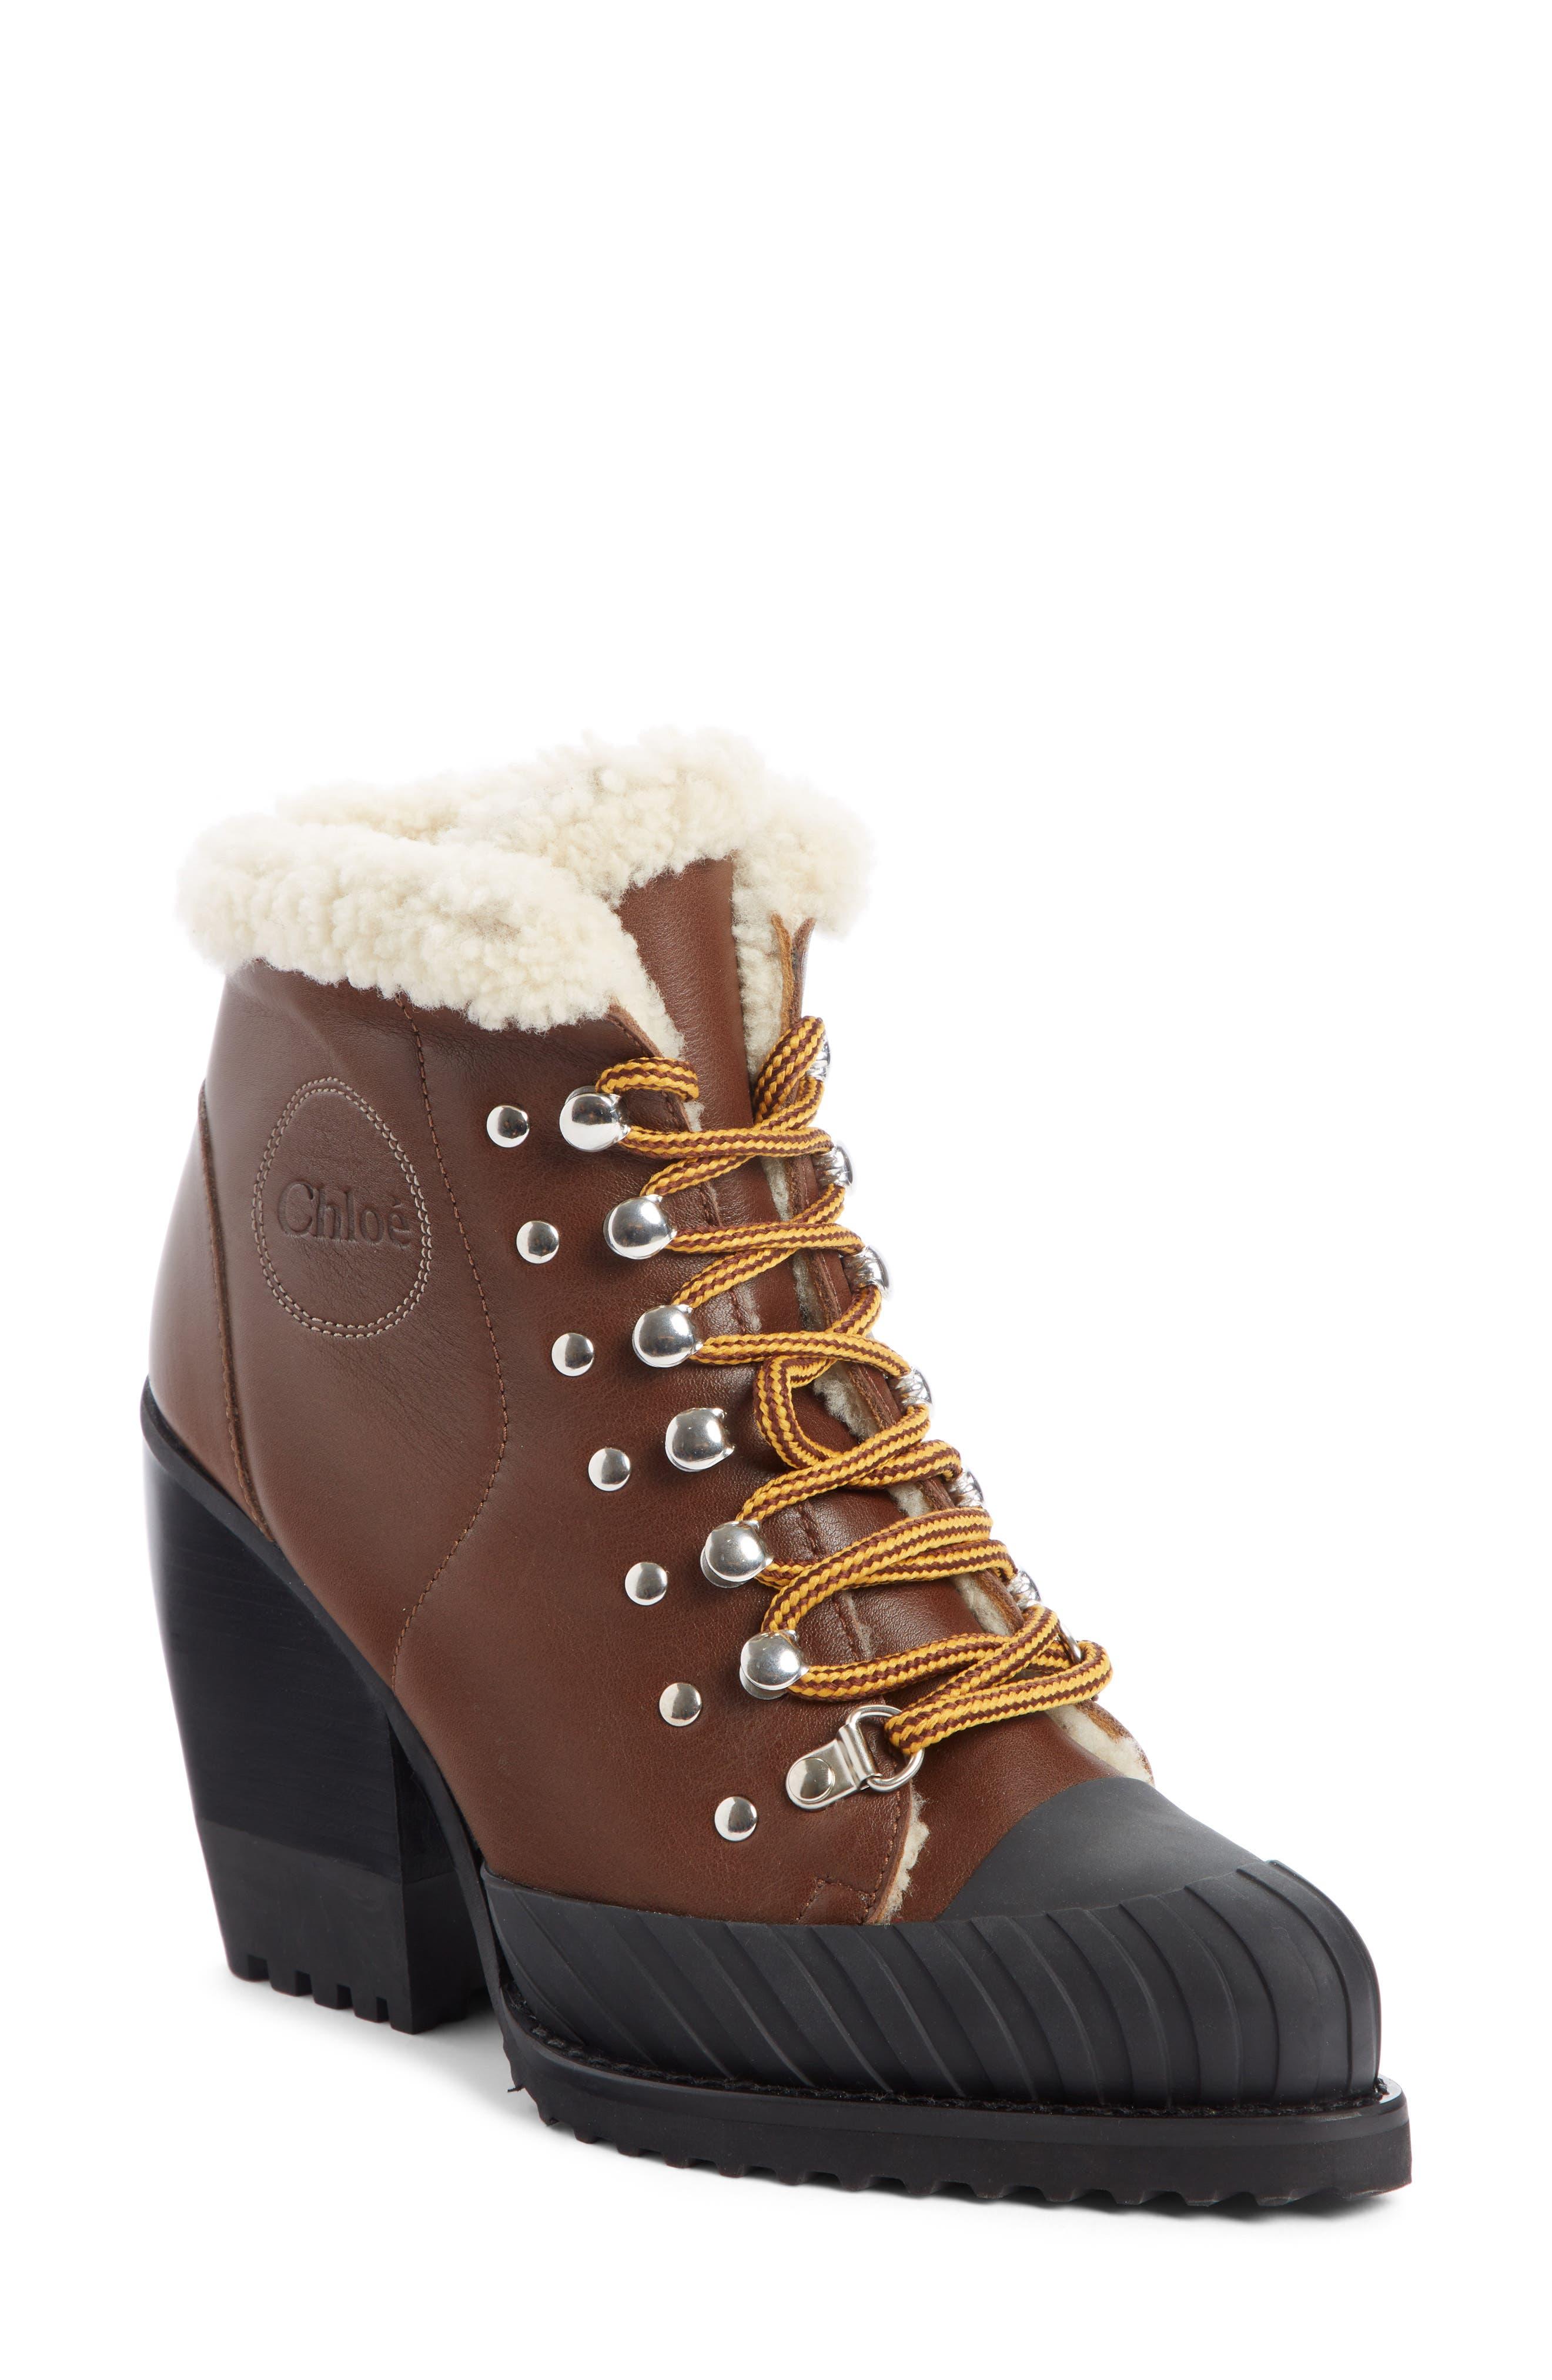 Chloe Rylee Genuine Shearling Lined Hiking Boot